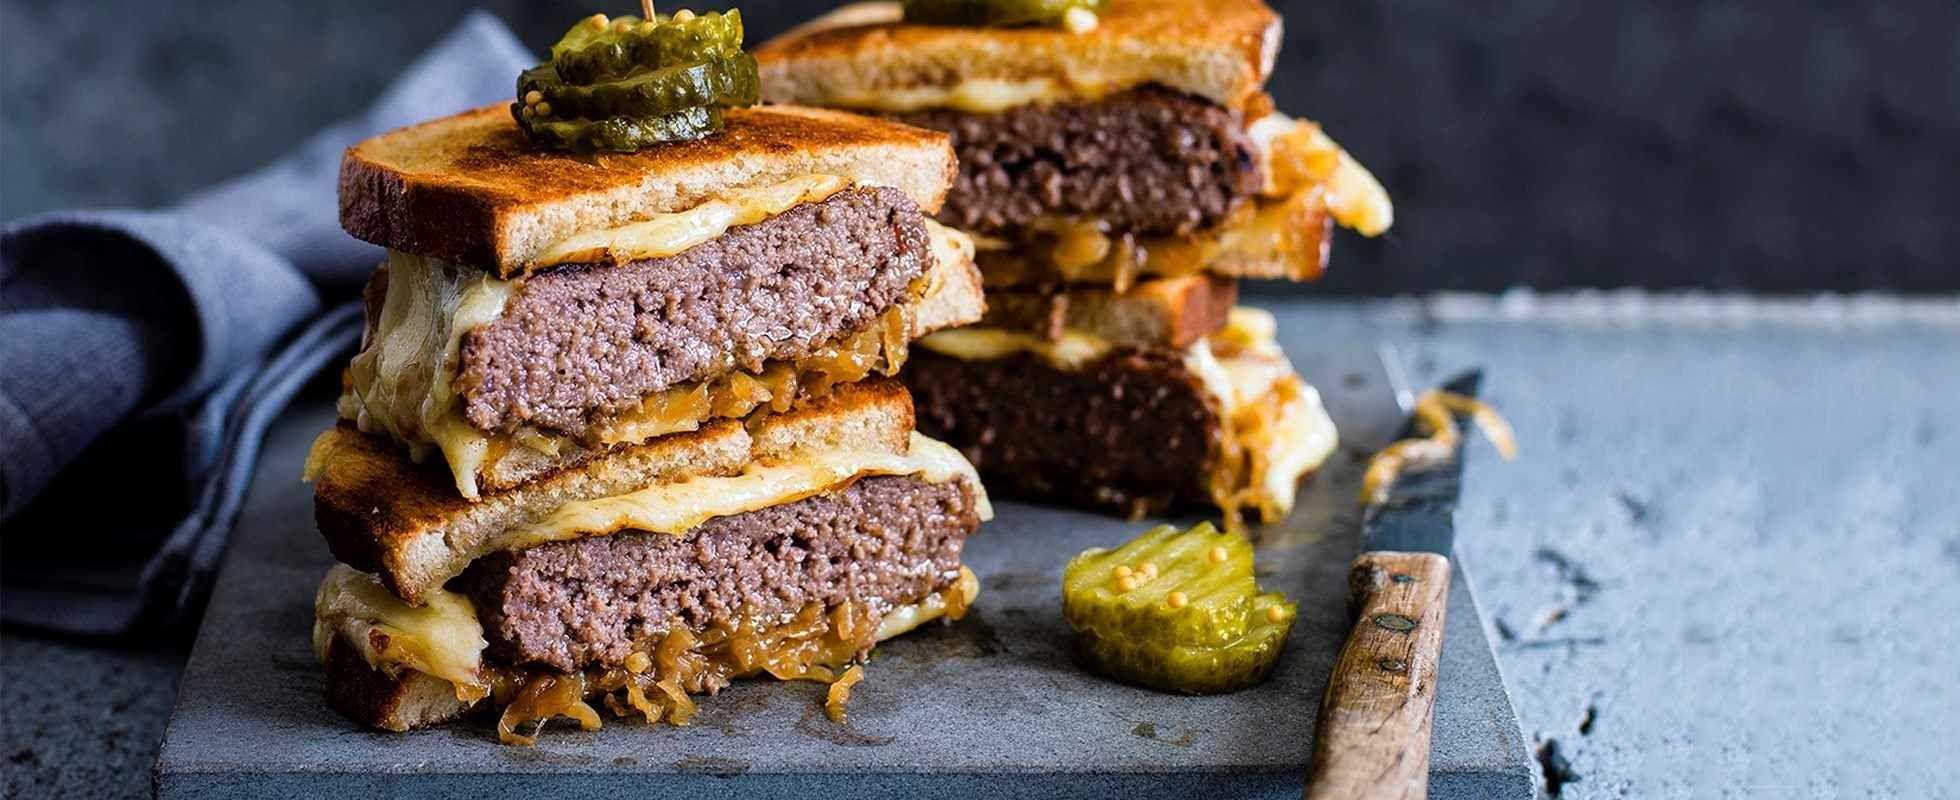 The patty melt sandwich Recipe in 2020 Patty melt